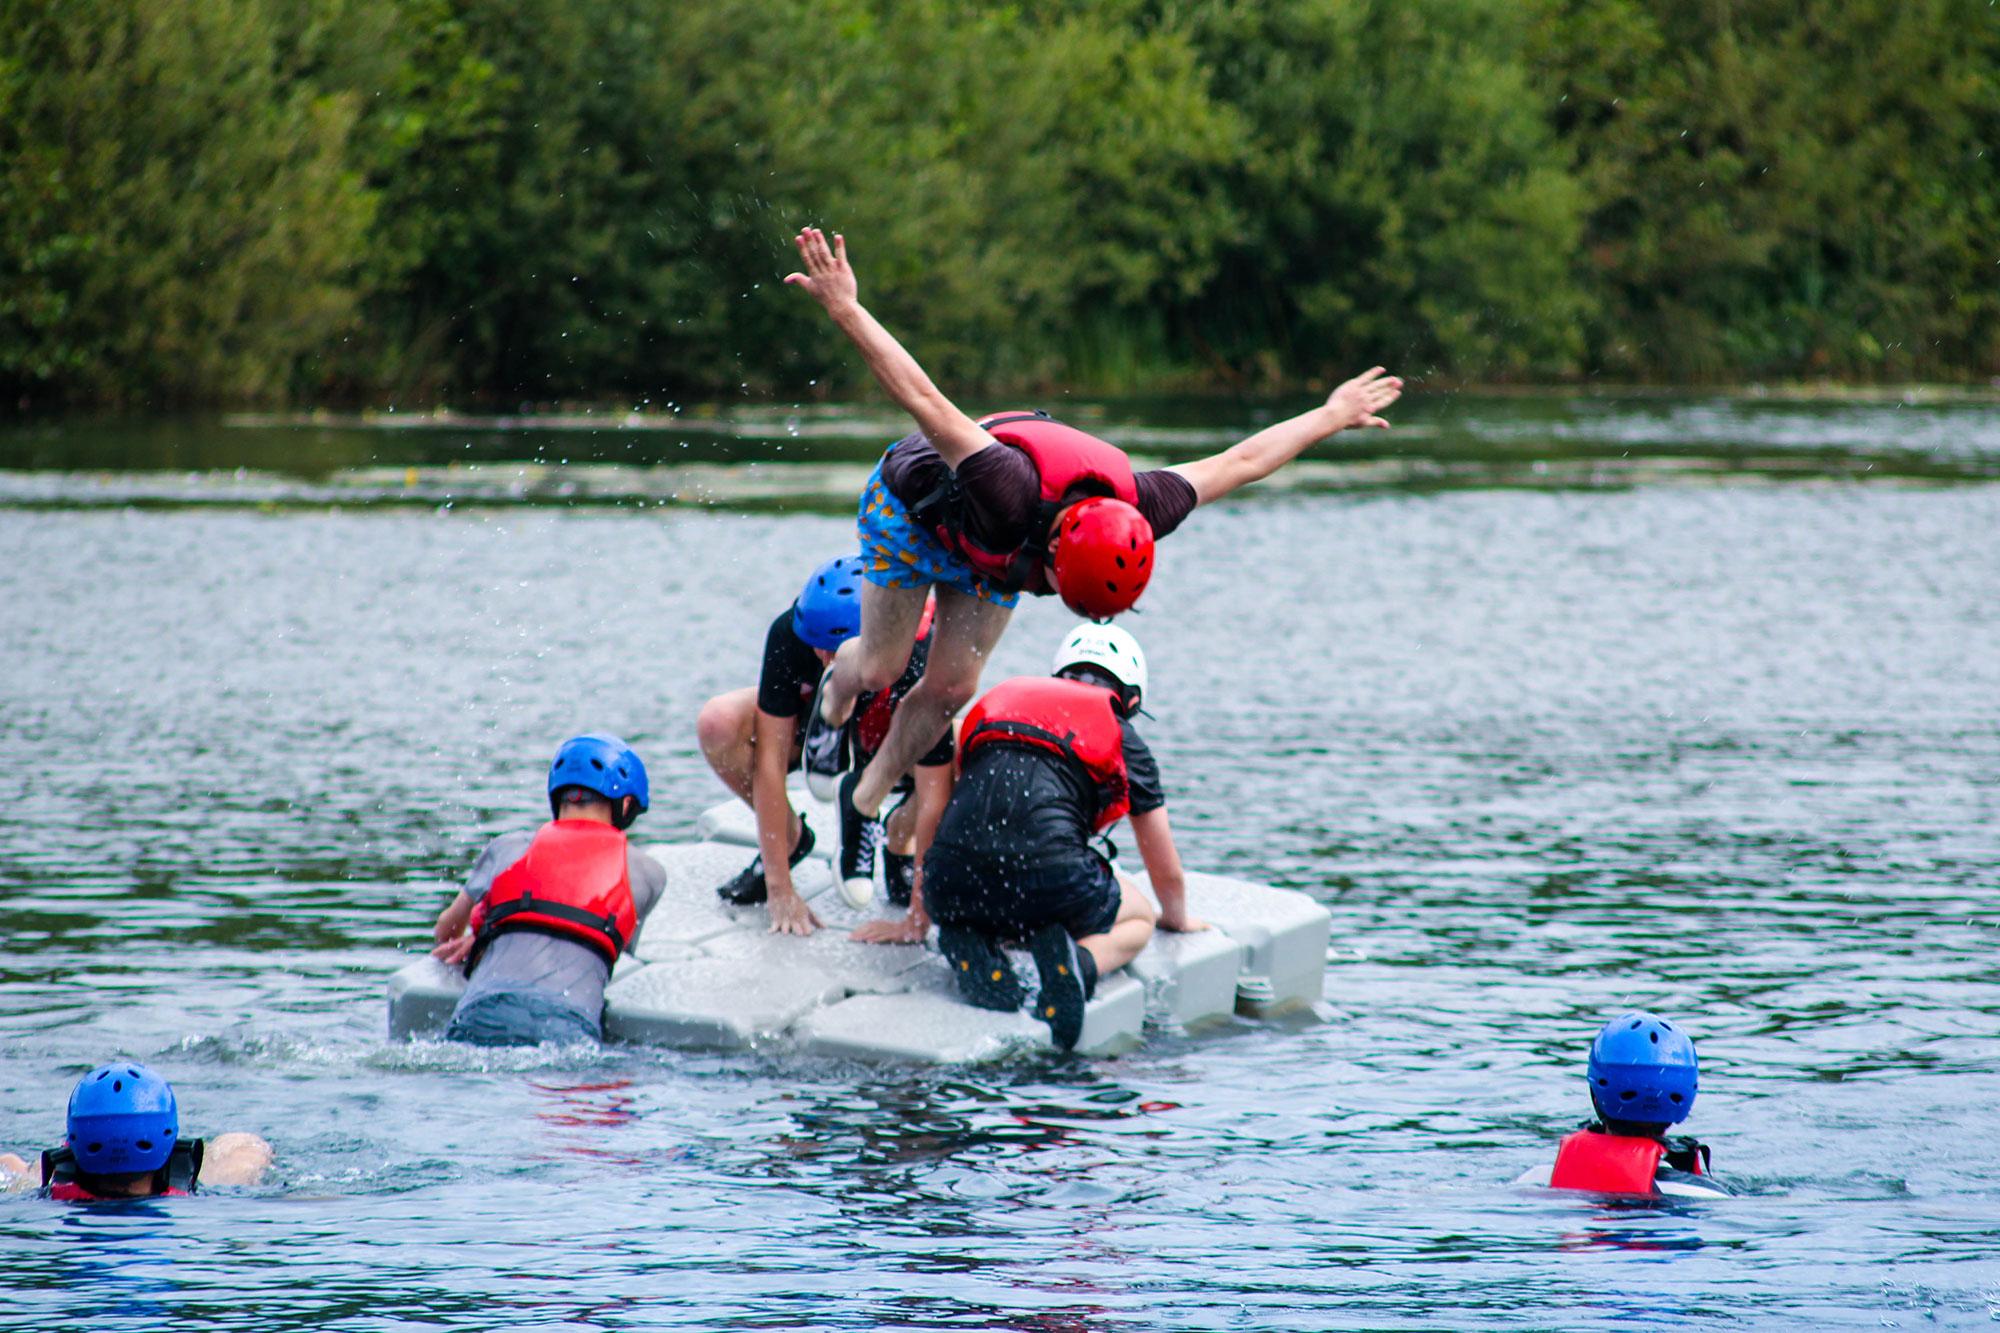 District Explorer Summer Camp